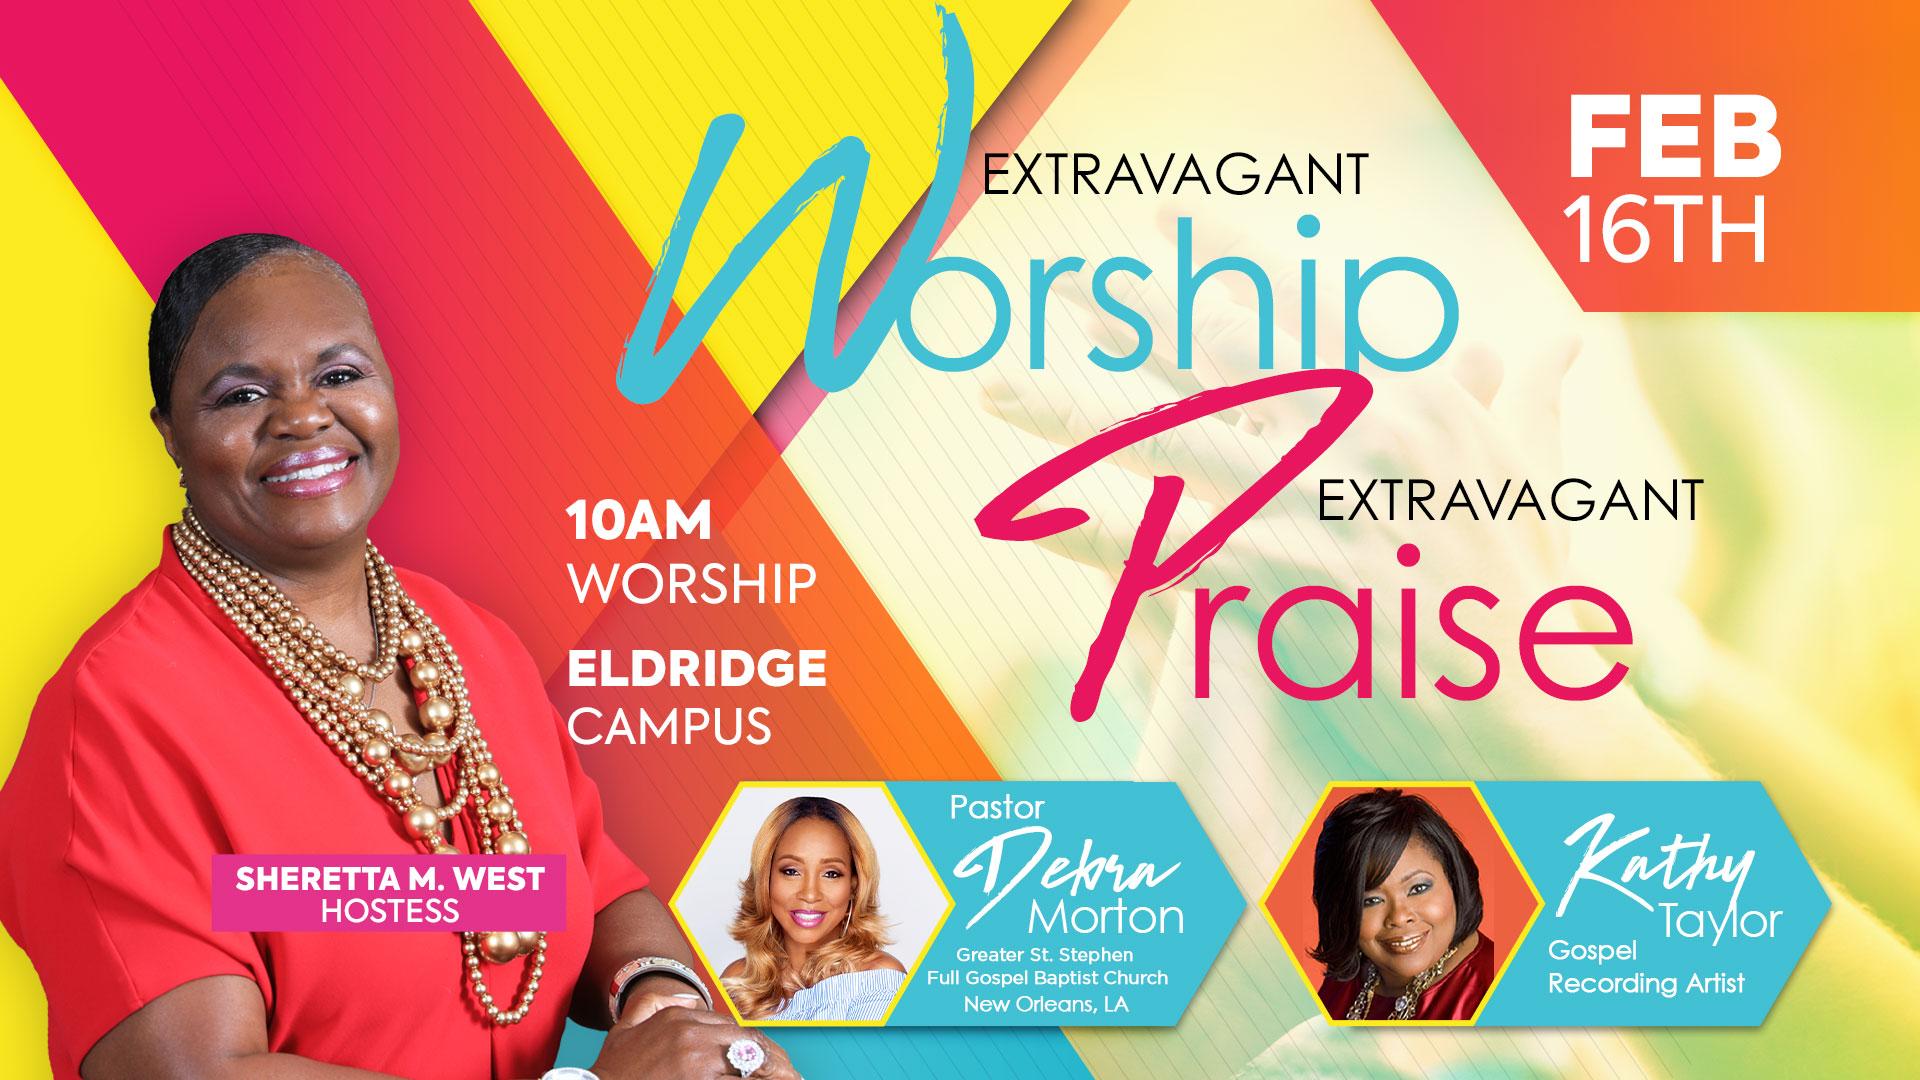 Extravagant Worship Extravagant Praise 2019